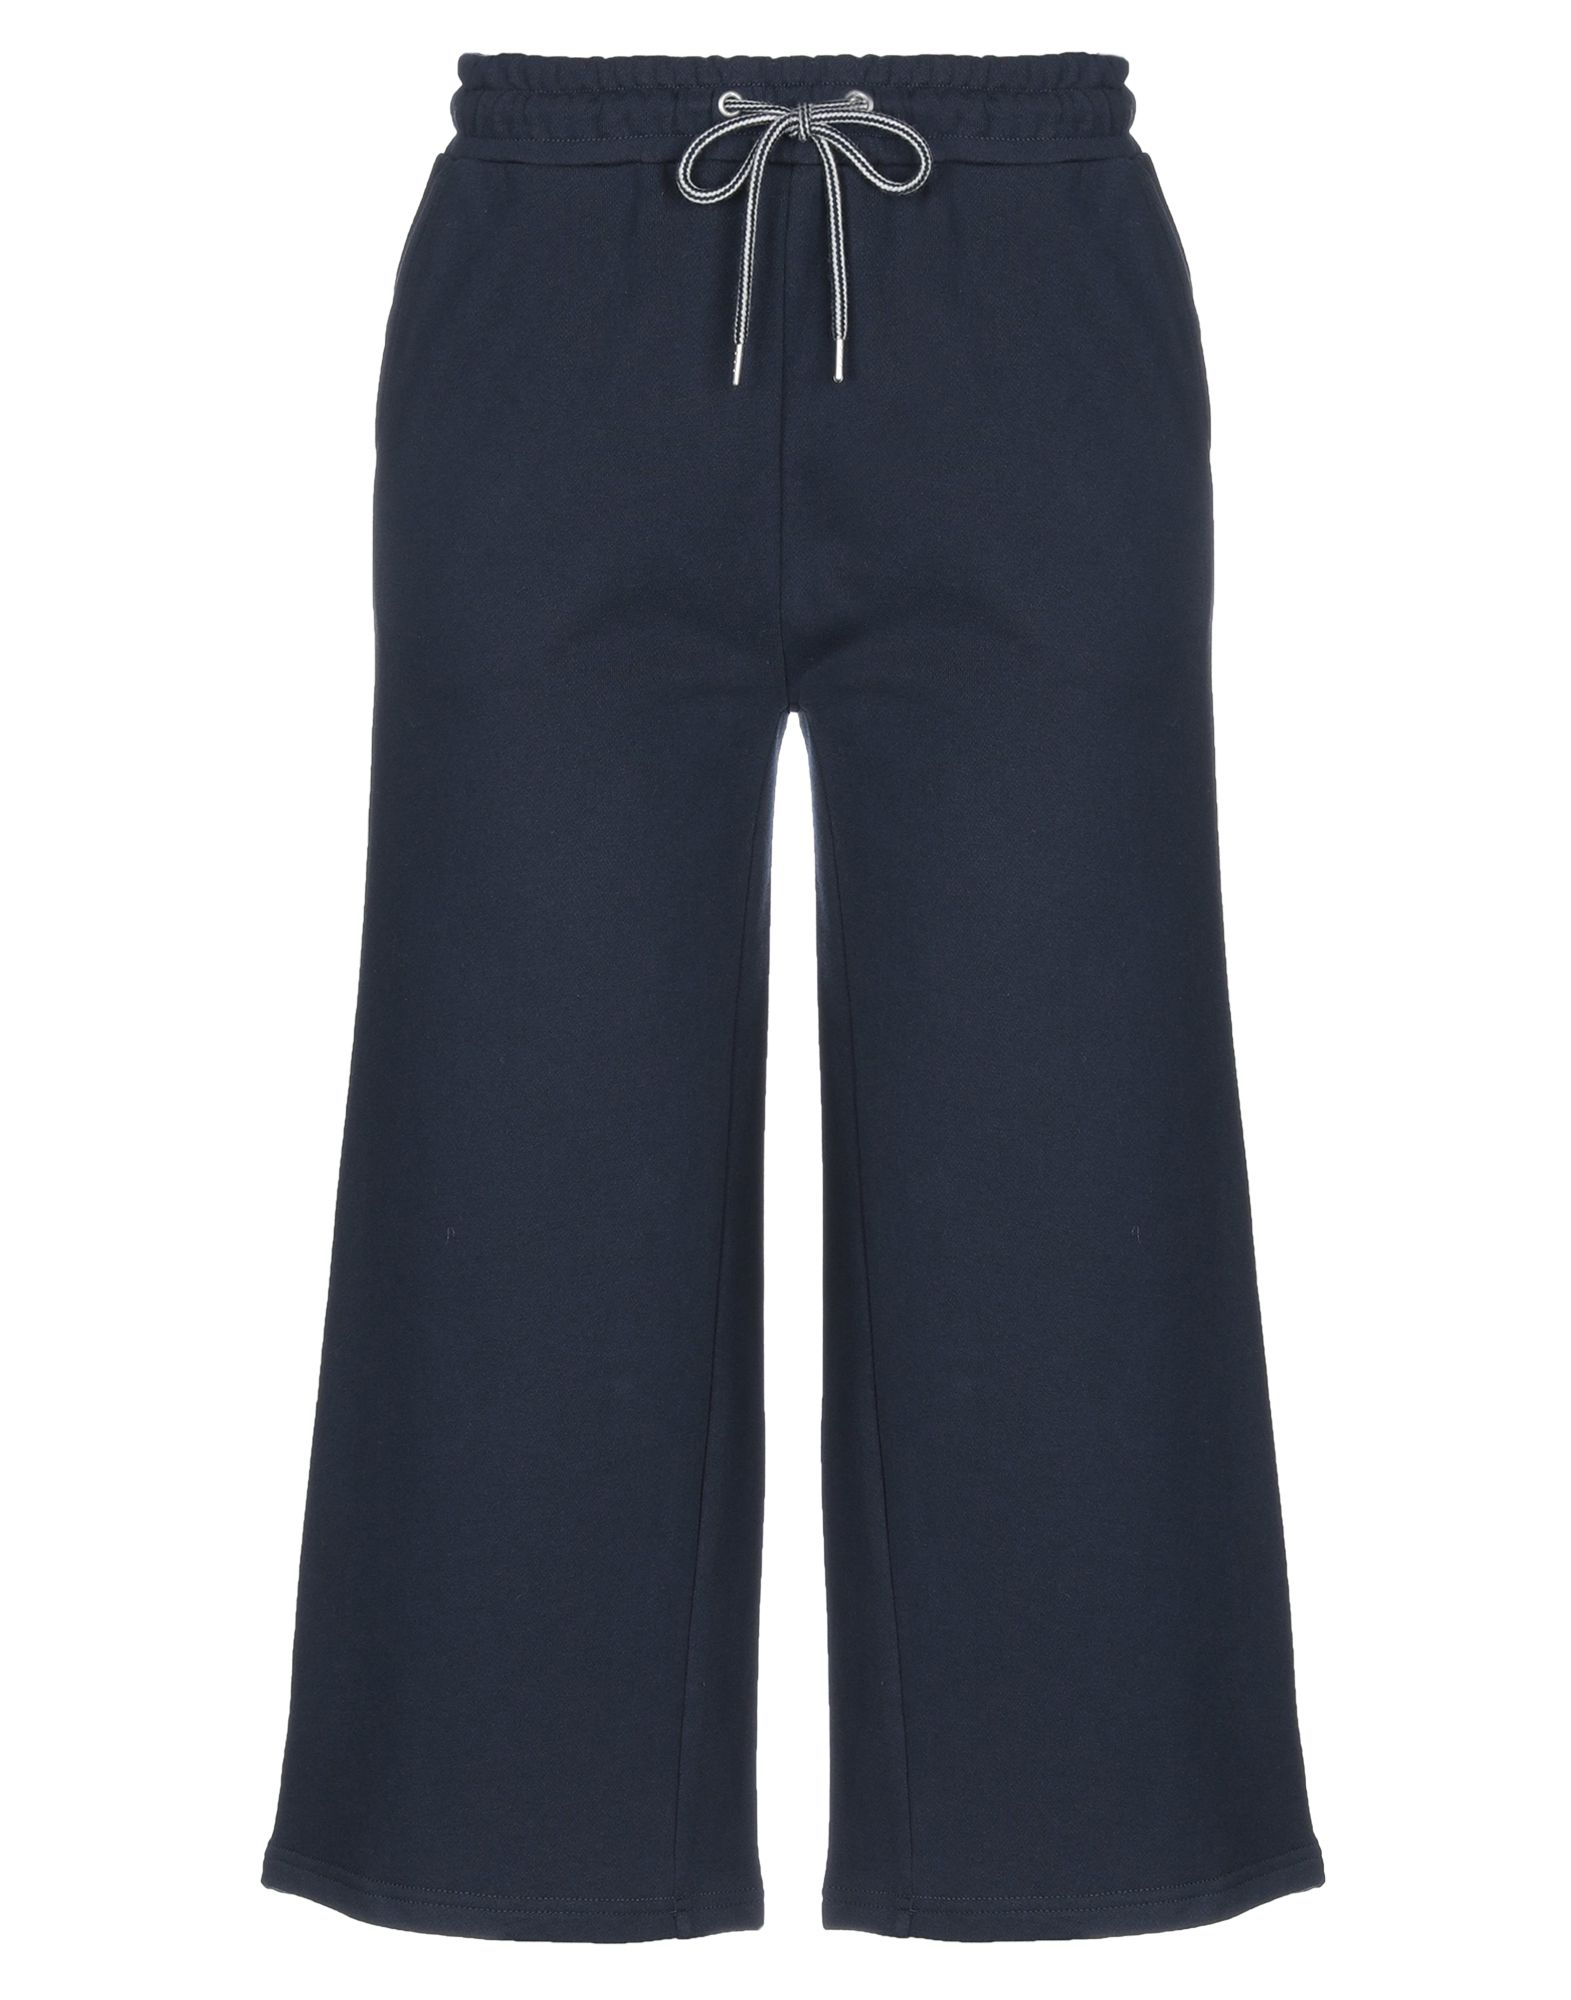 PENN-RICH WOOLRICH (PA) Брюки-капри woolrich брюки капри